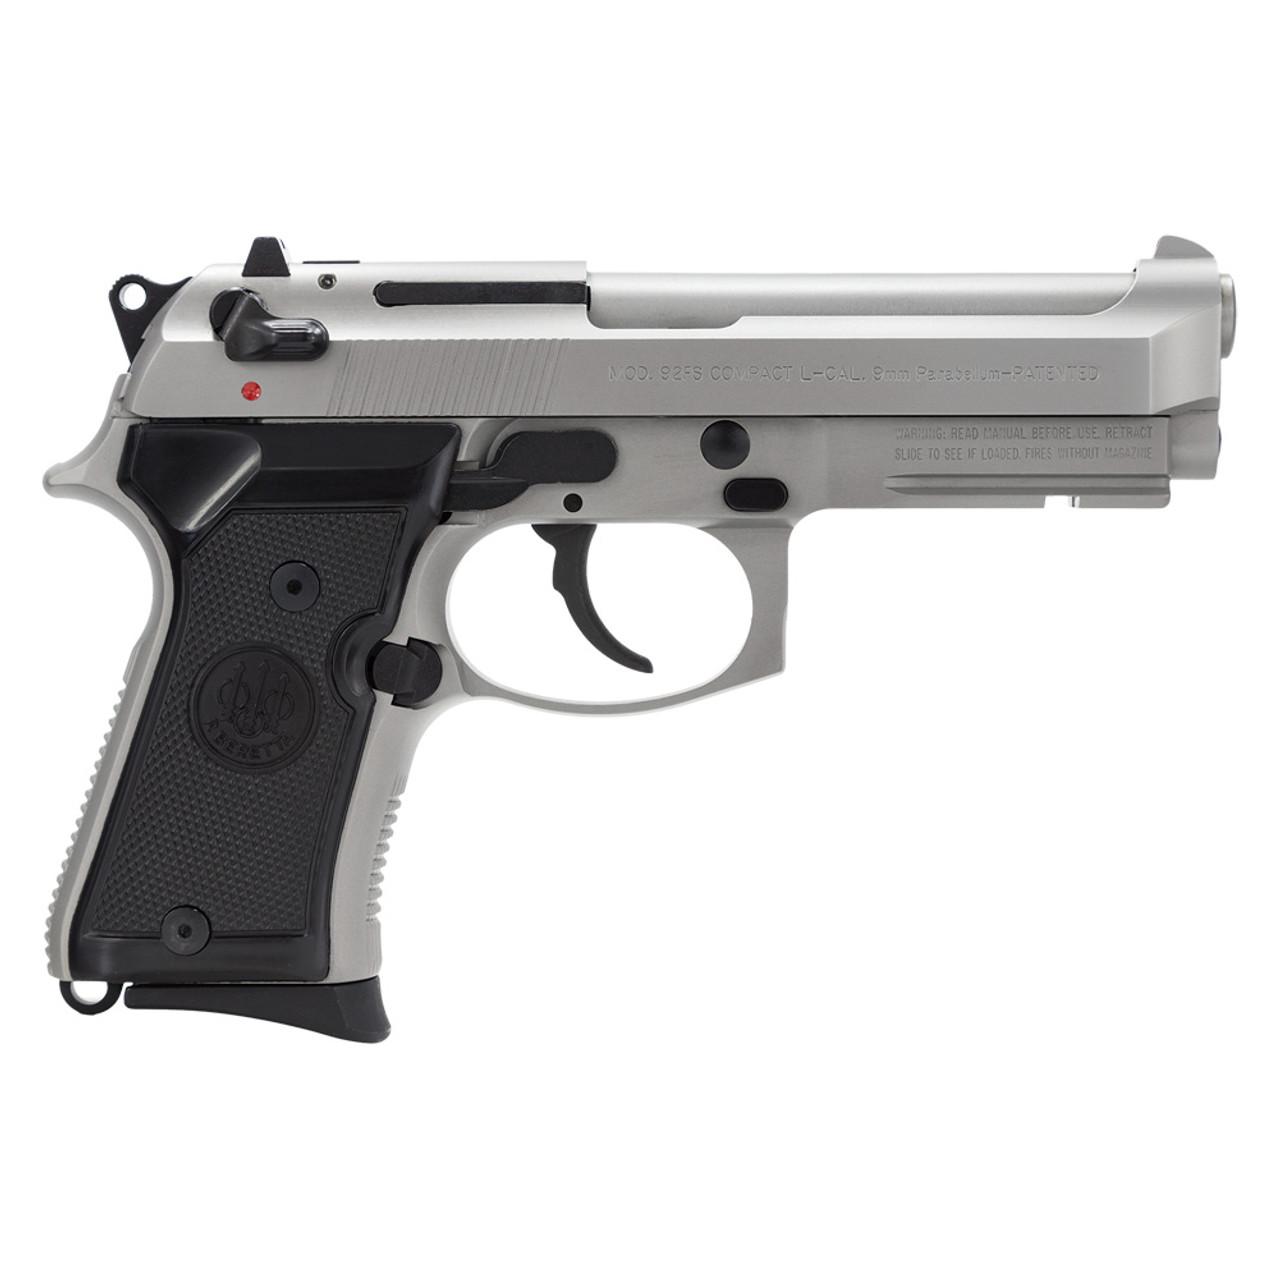 BERETTA 92FS Compact Inox With Rail 9 mm 13Rd Stainless Pistol (J90C9F20)